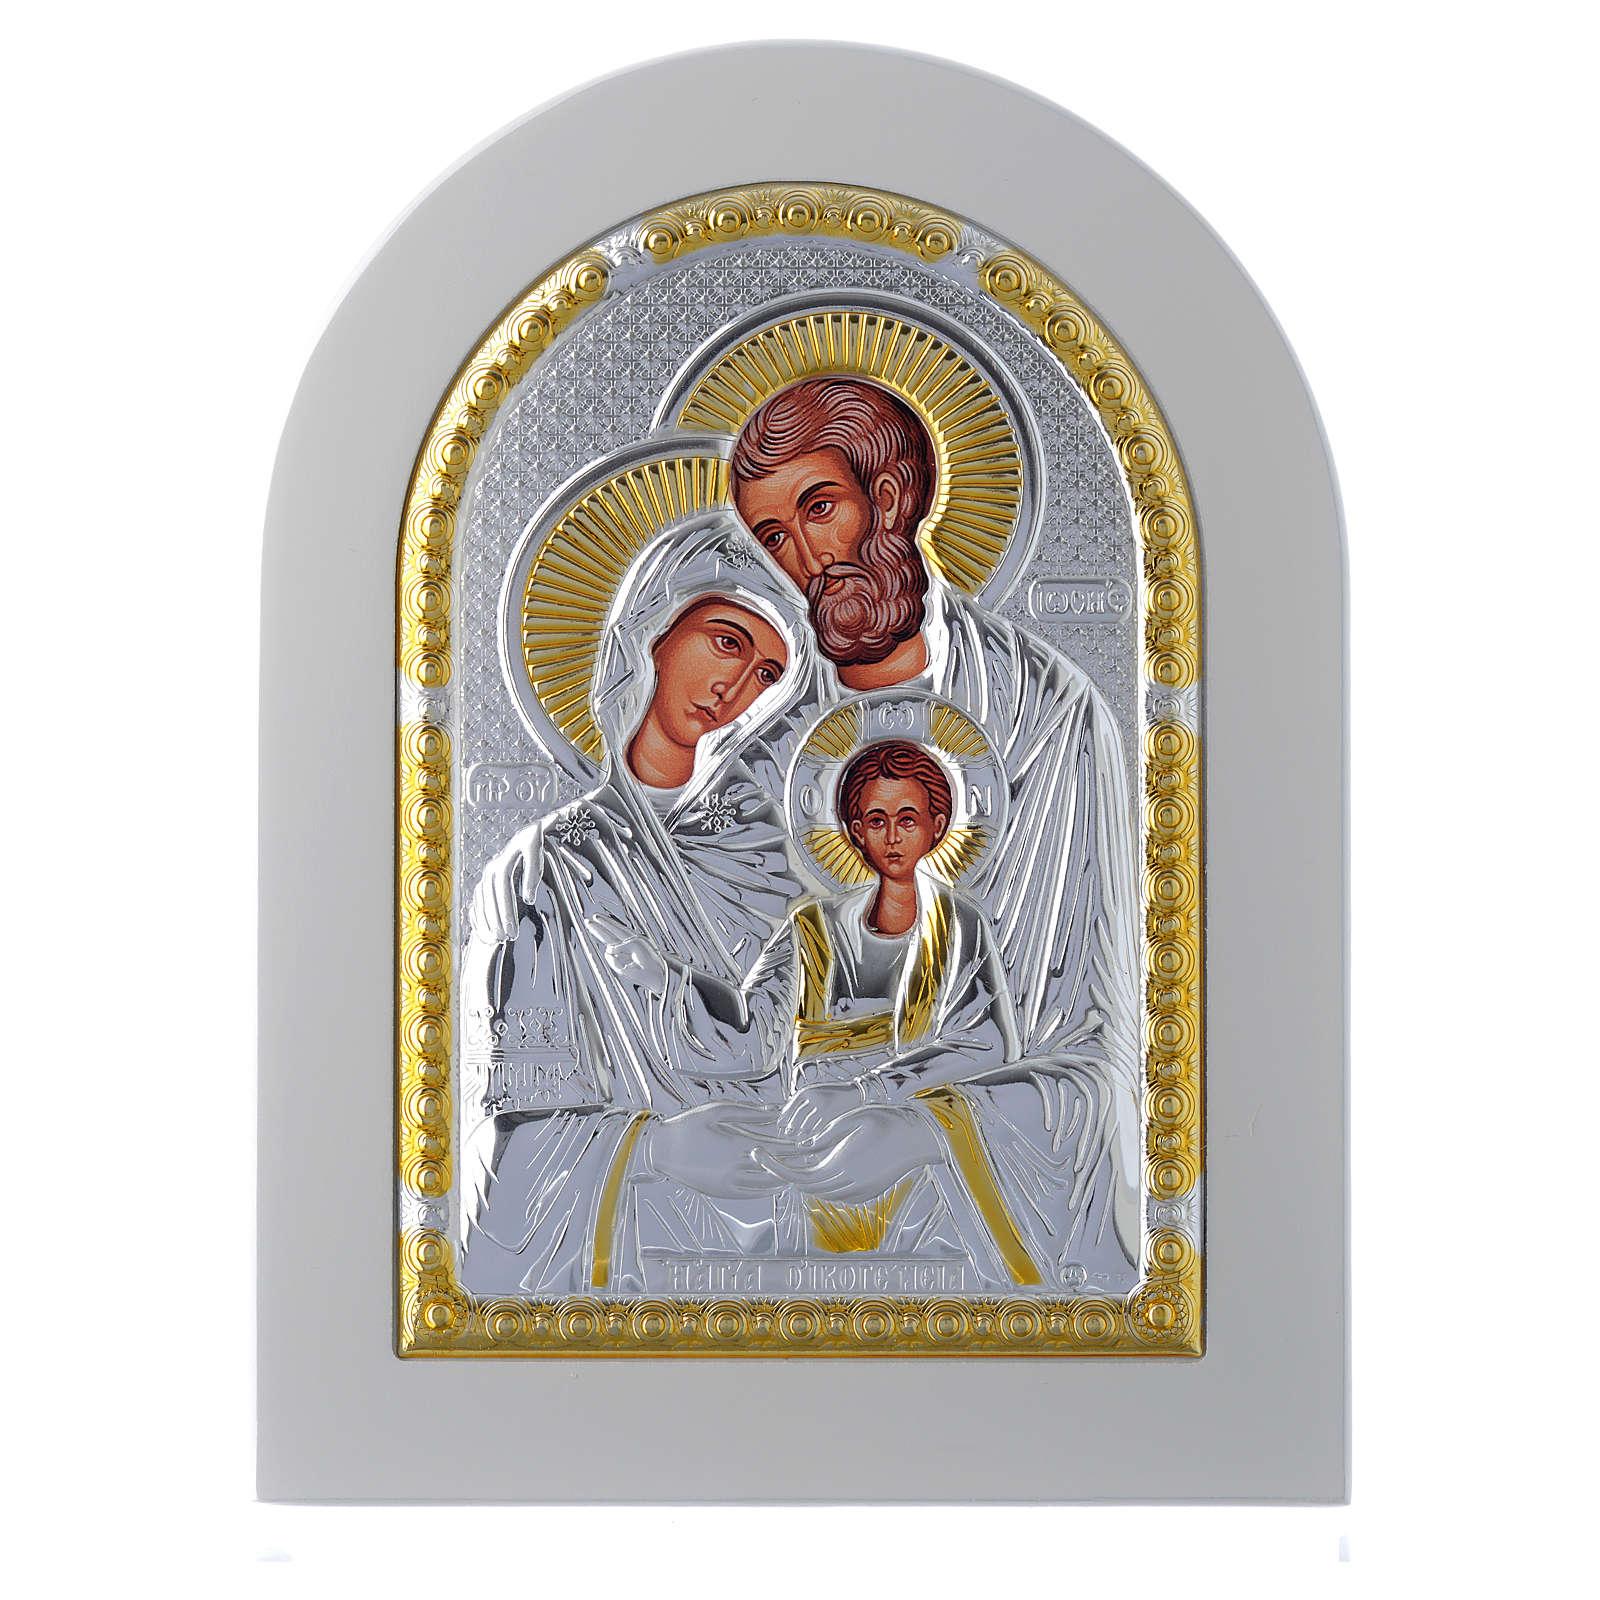 Icona Sacra Famiglia 18x14 cm argento 925 finiture dorate 4